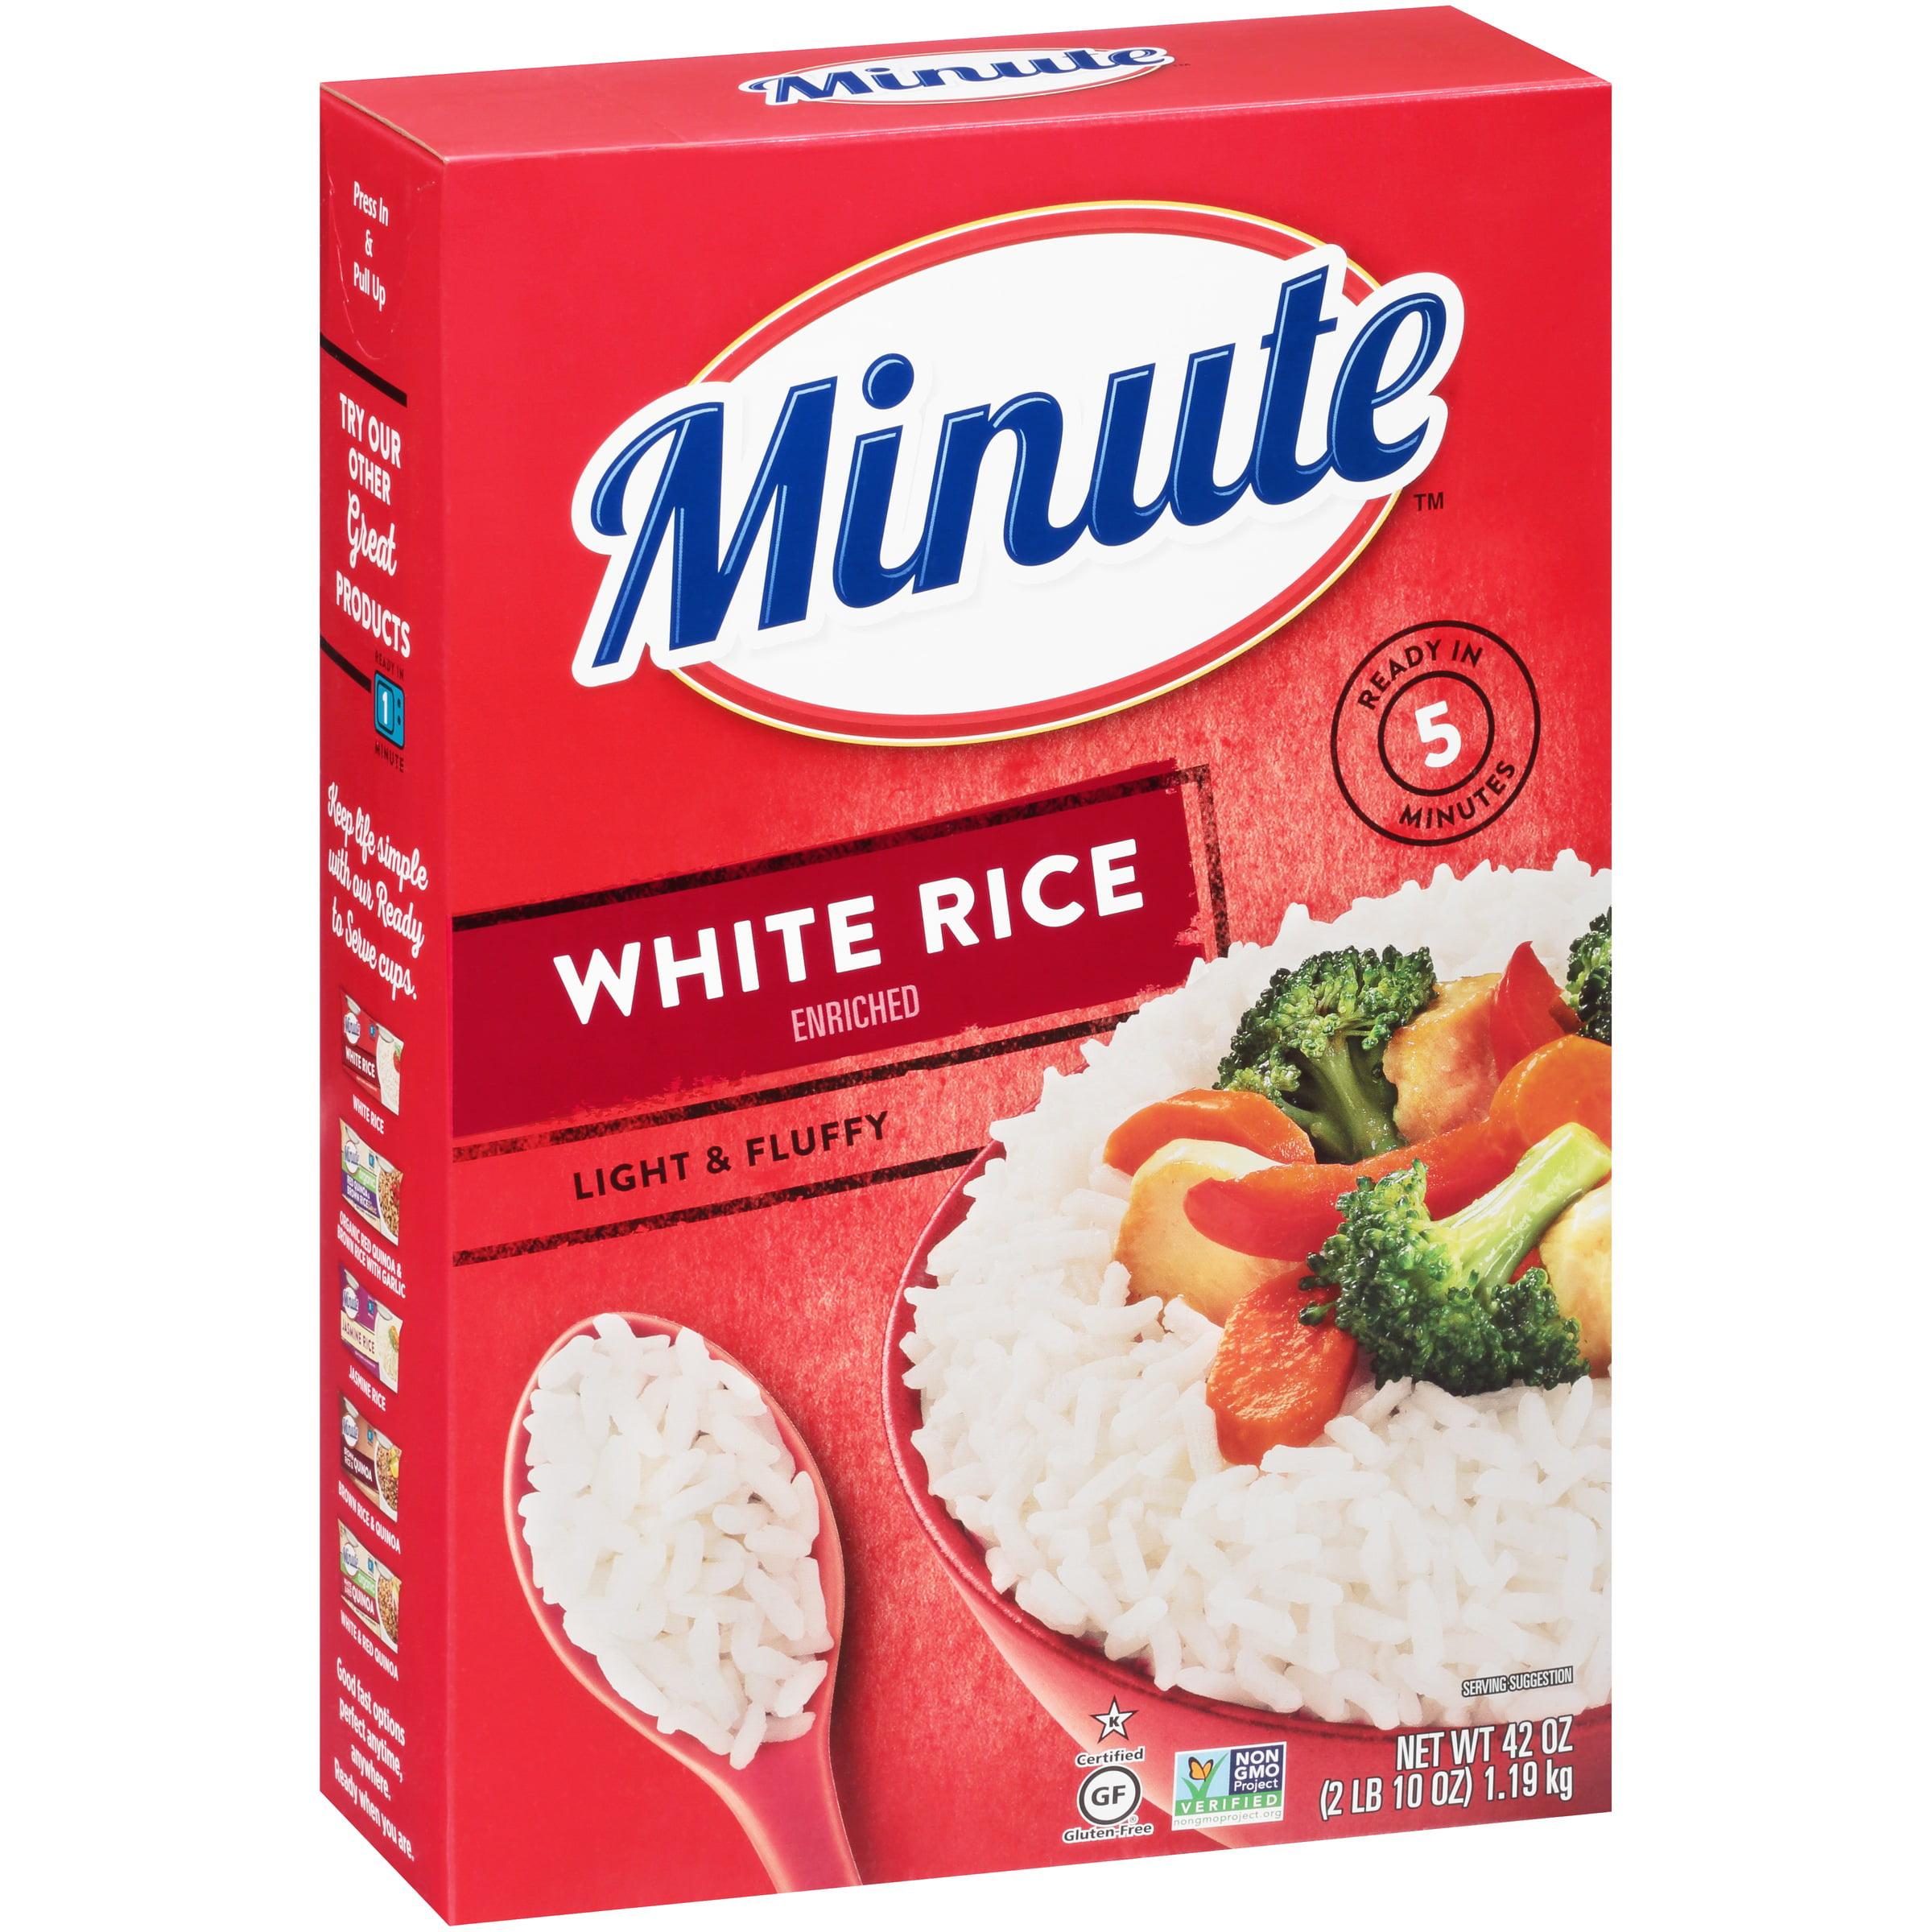 Minute White Instant Enriched Long Grain Rice 42 Oz Box